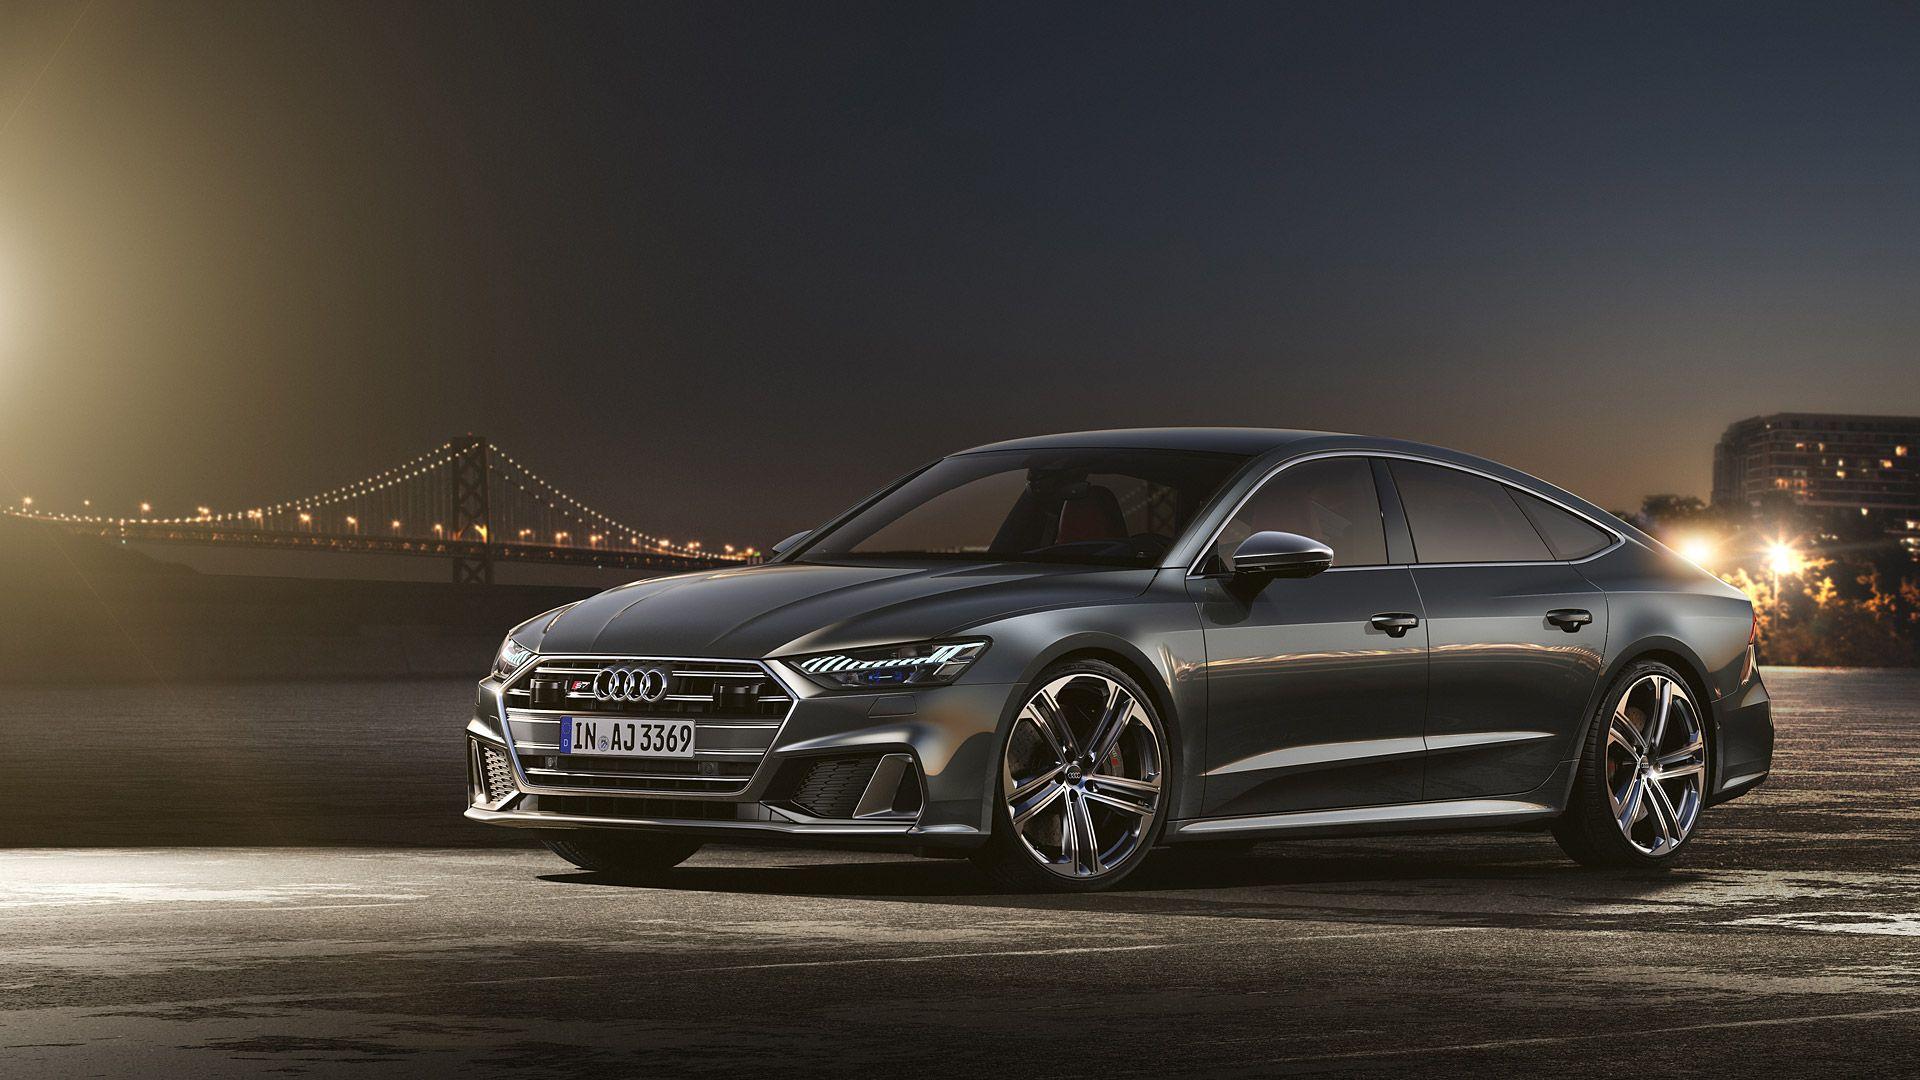 2020 Audi S7 Sportback Audi Audi Tt Audi A7